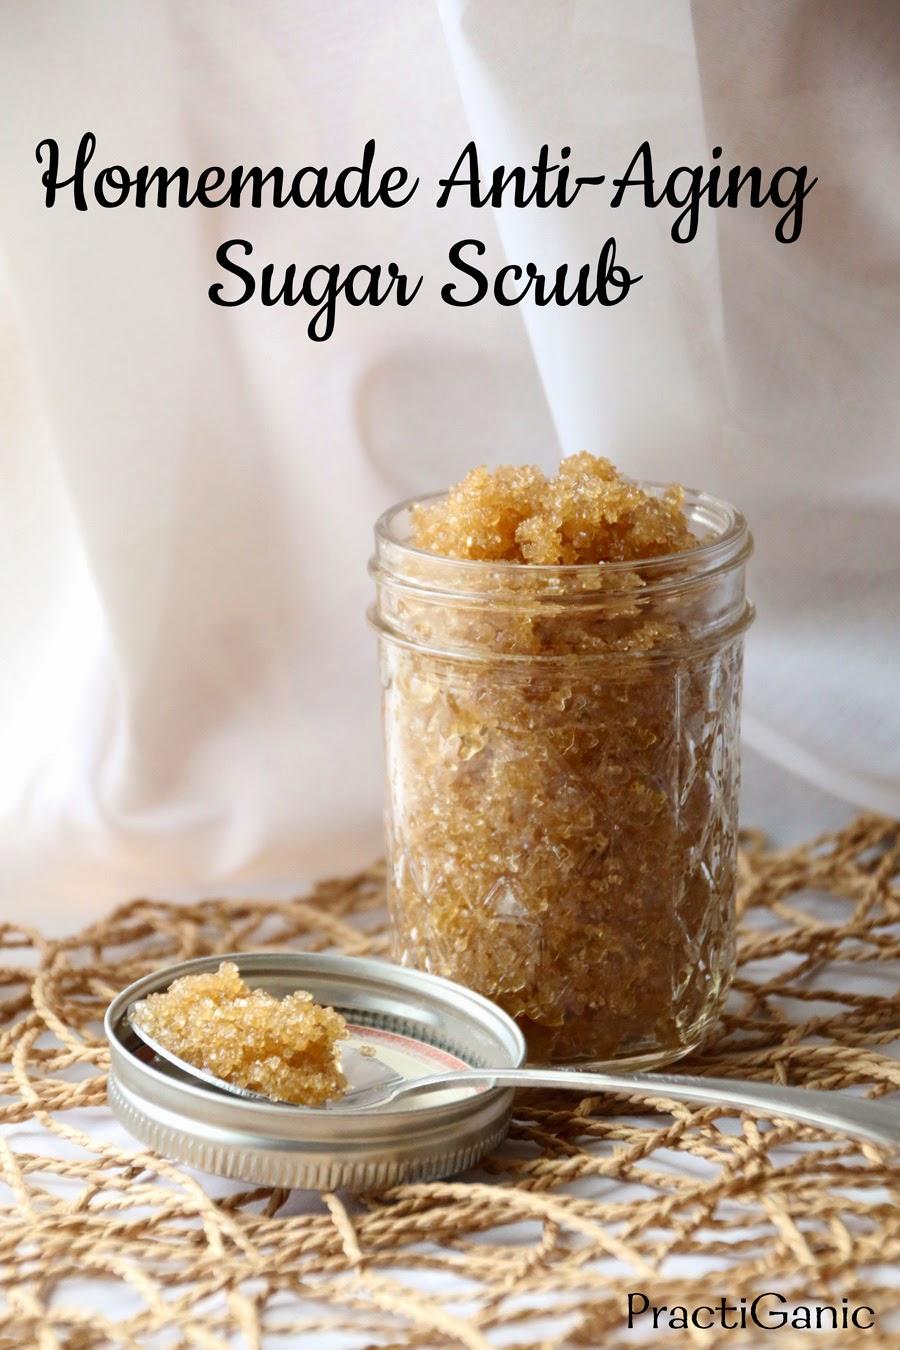 Homemade Anti-Aging Sugar Scrub